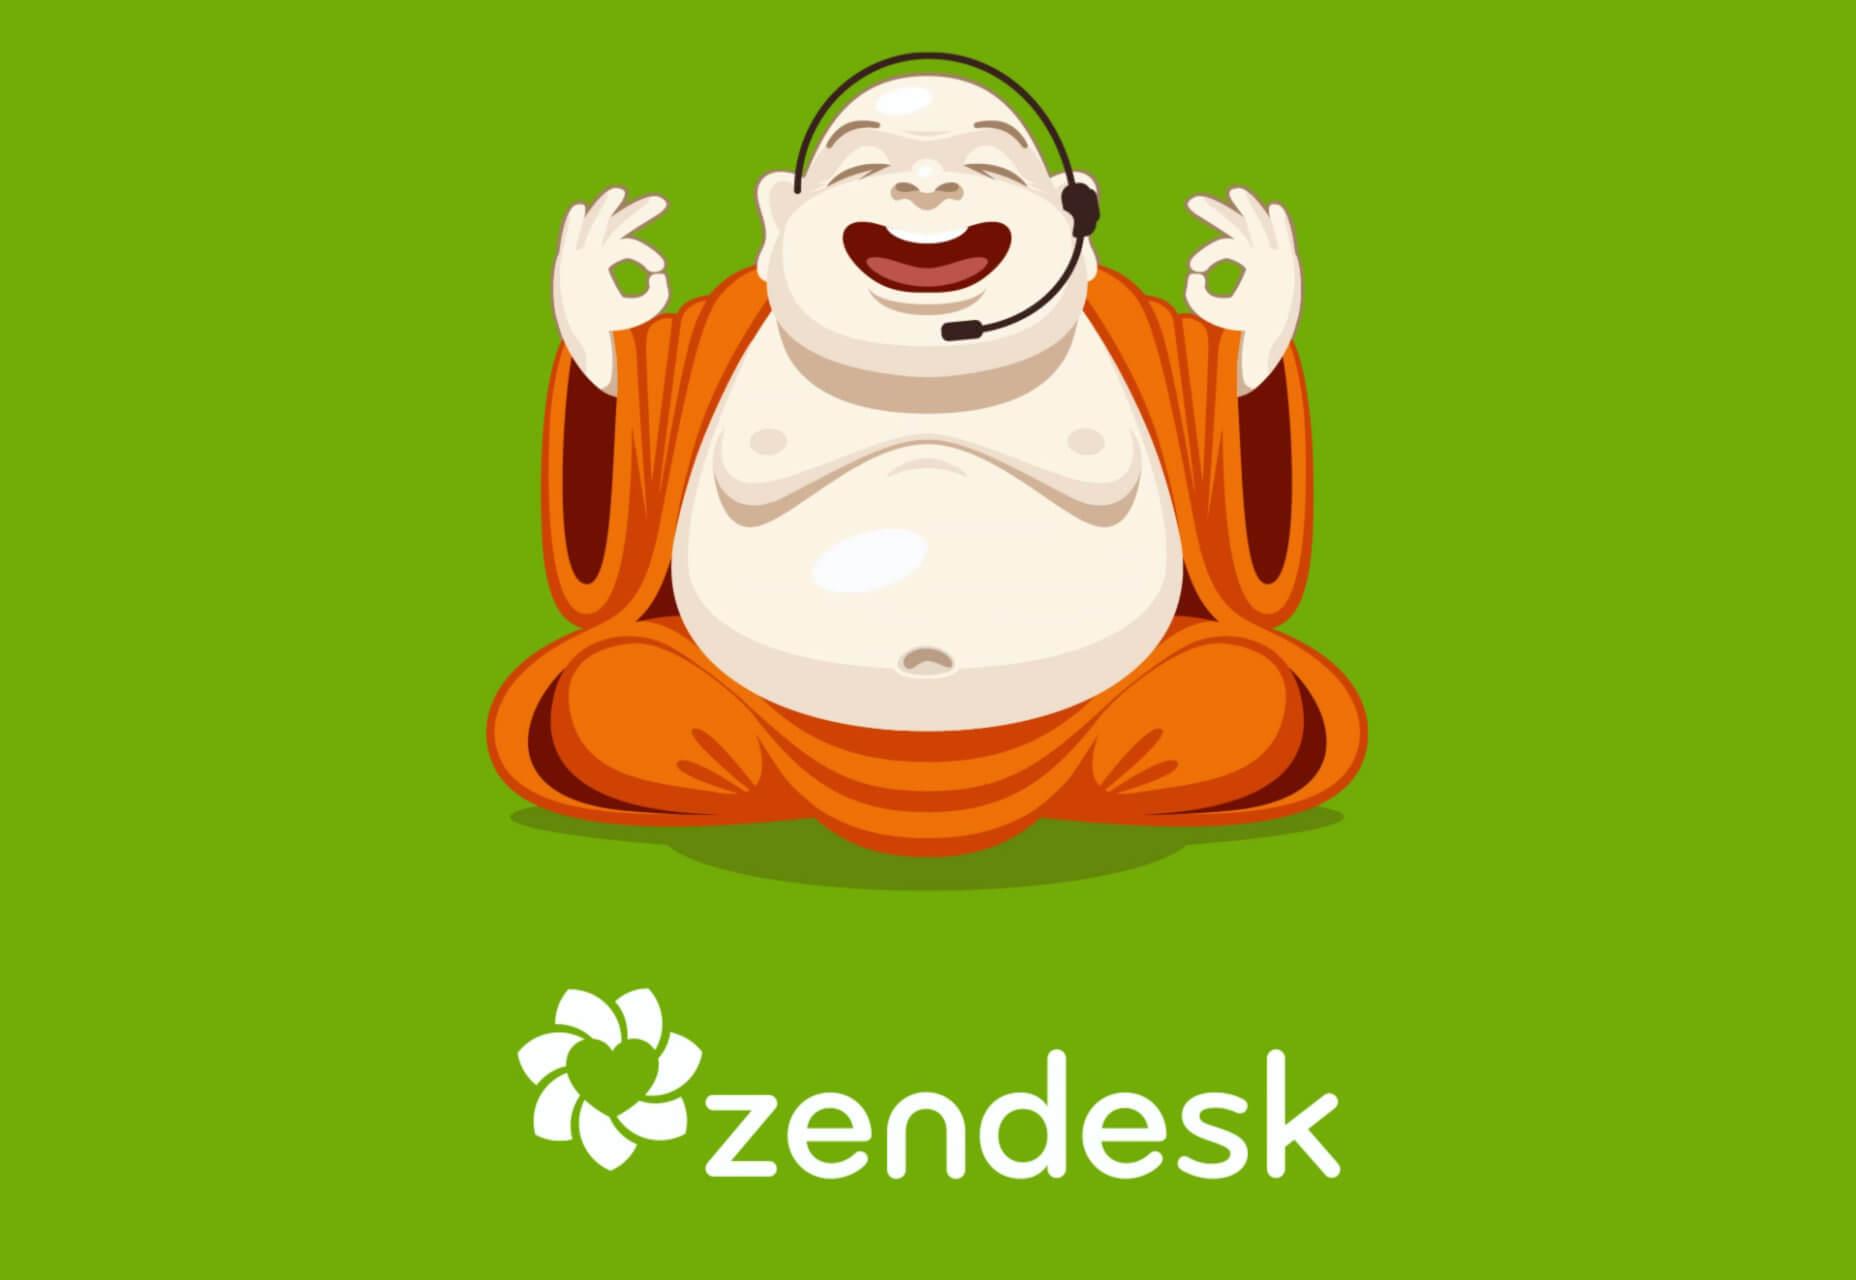 Zendesk old logo